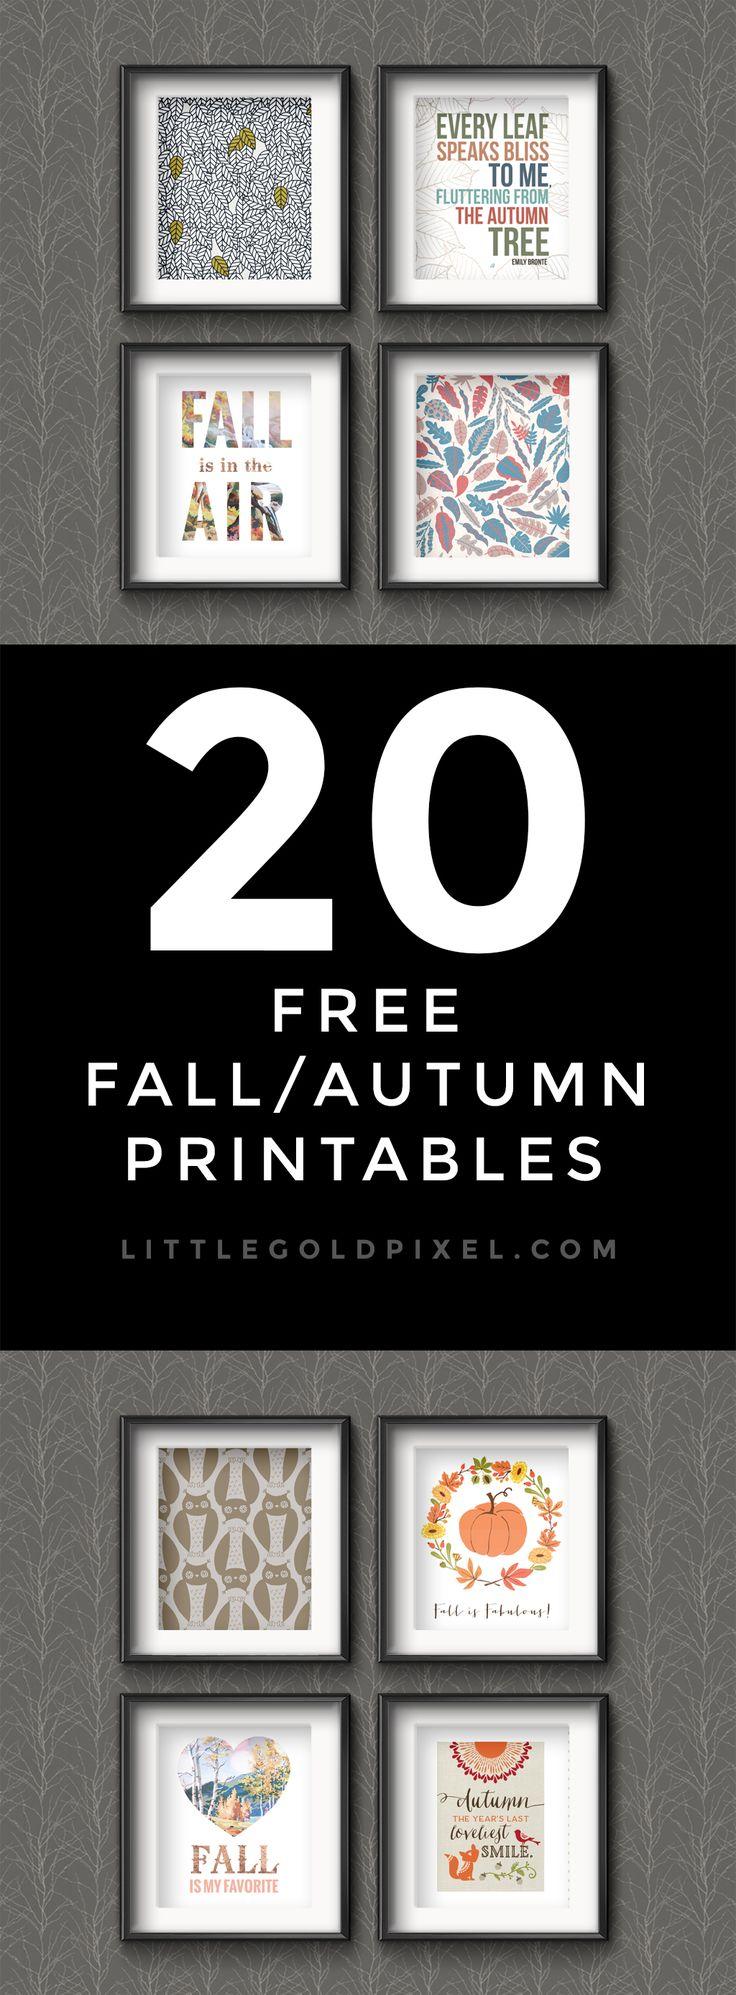 20 Awesome Free Fall Printables